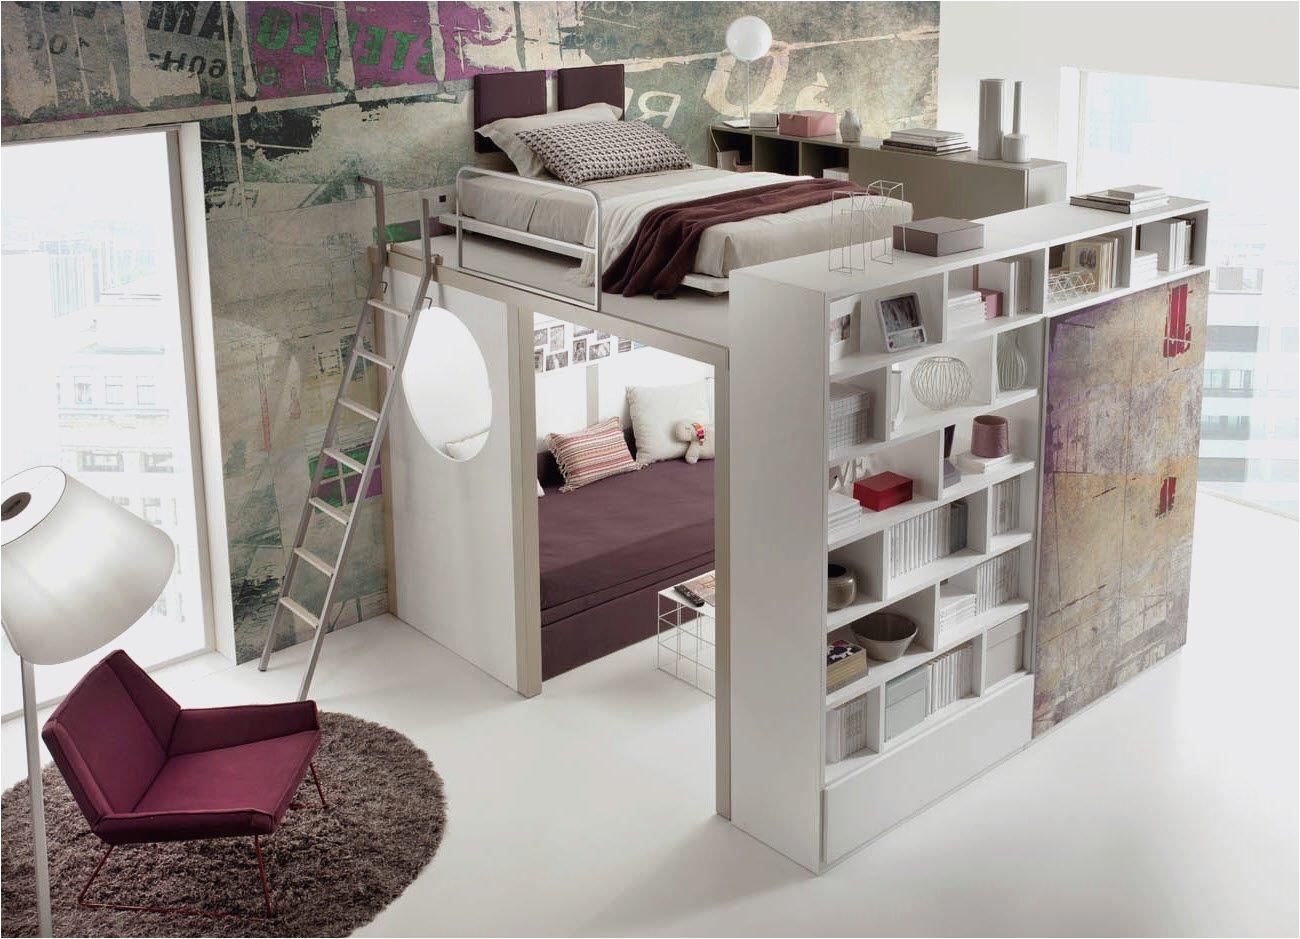 Lit Mezzanine Dressing Agréable Deco Lit Mezzanine Notice De Montage Lit Mezzanine Ikea